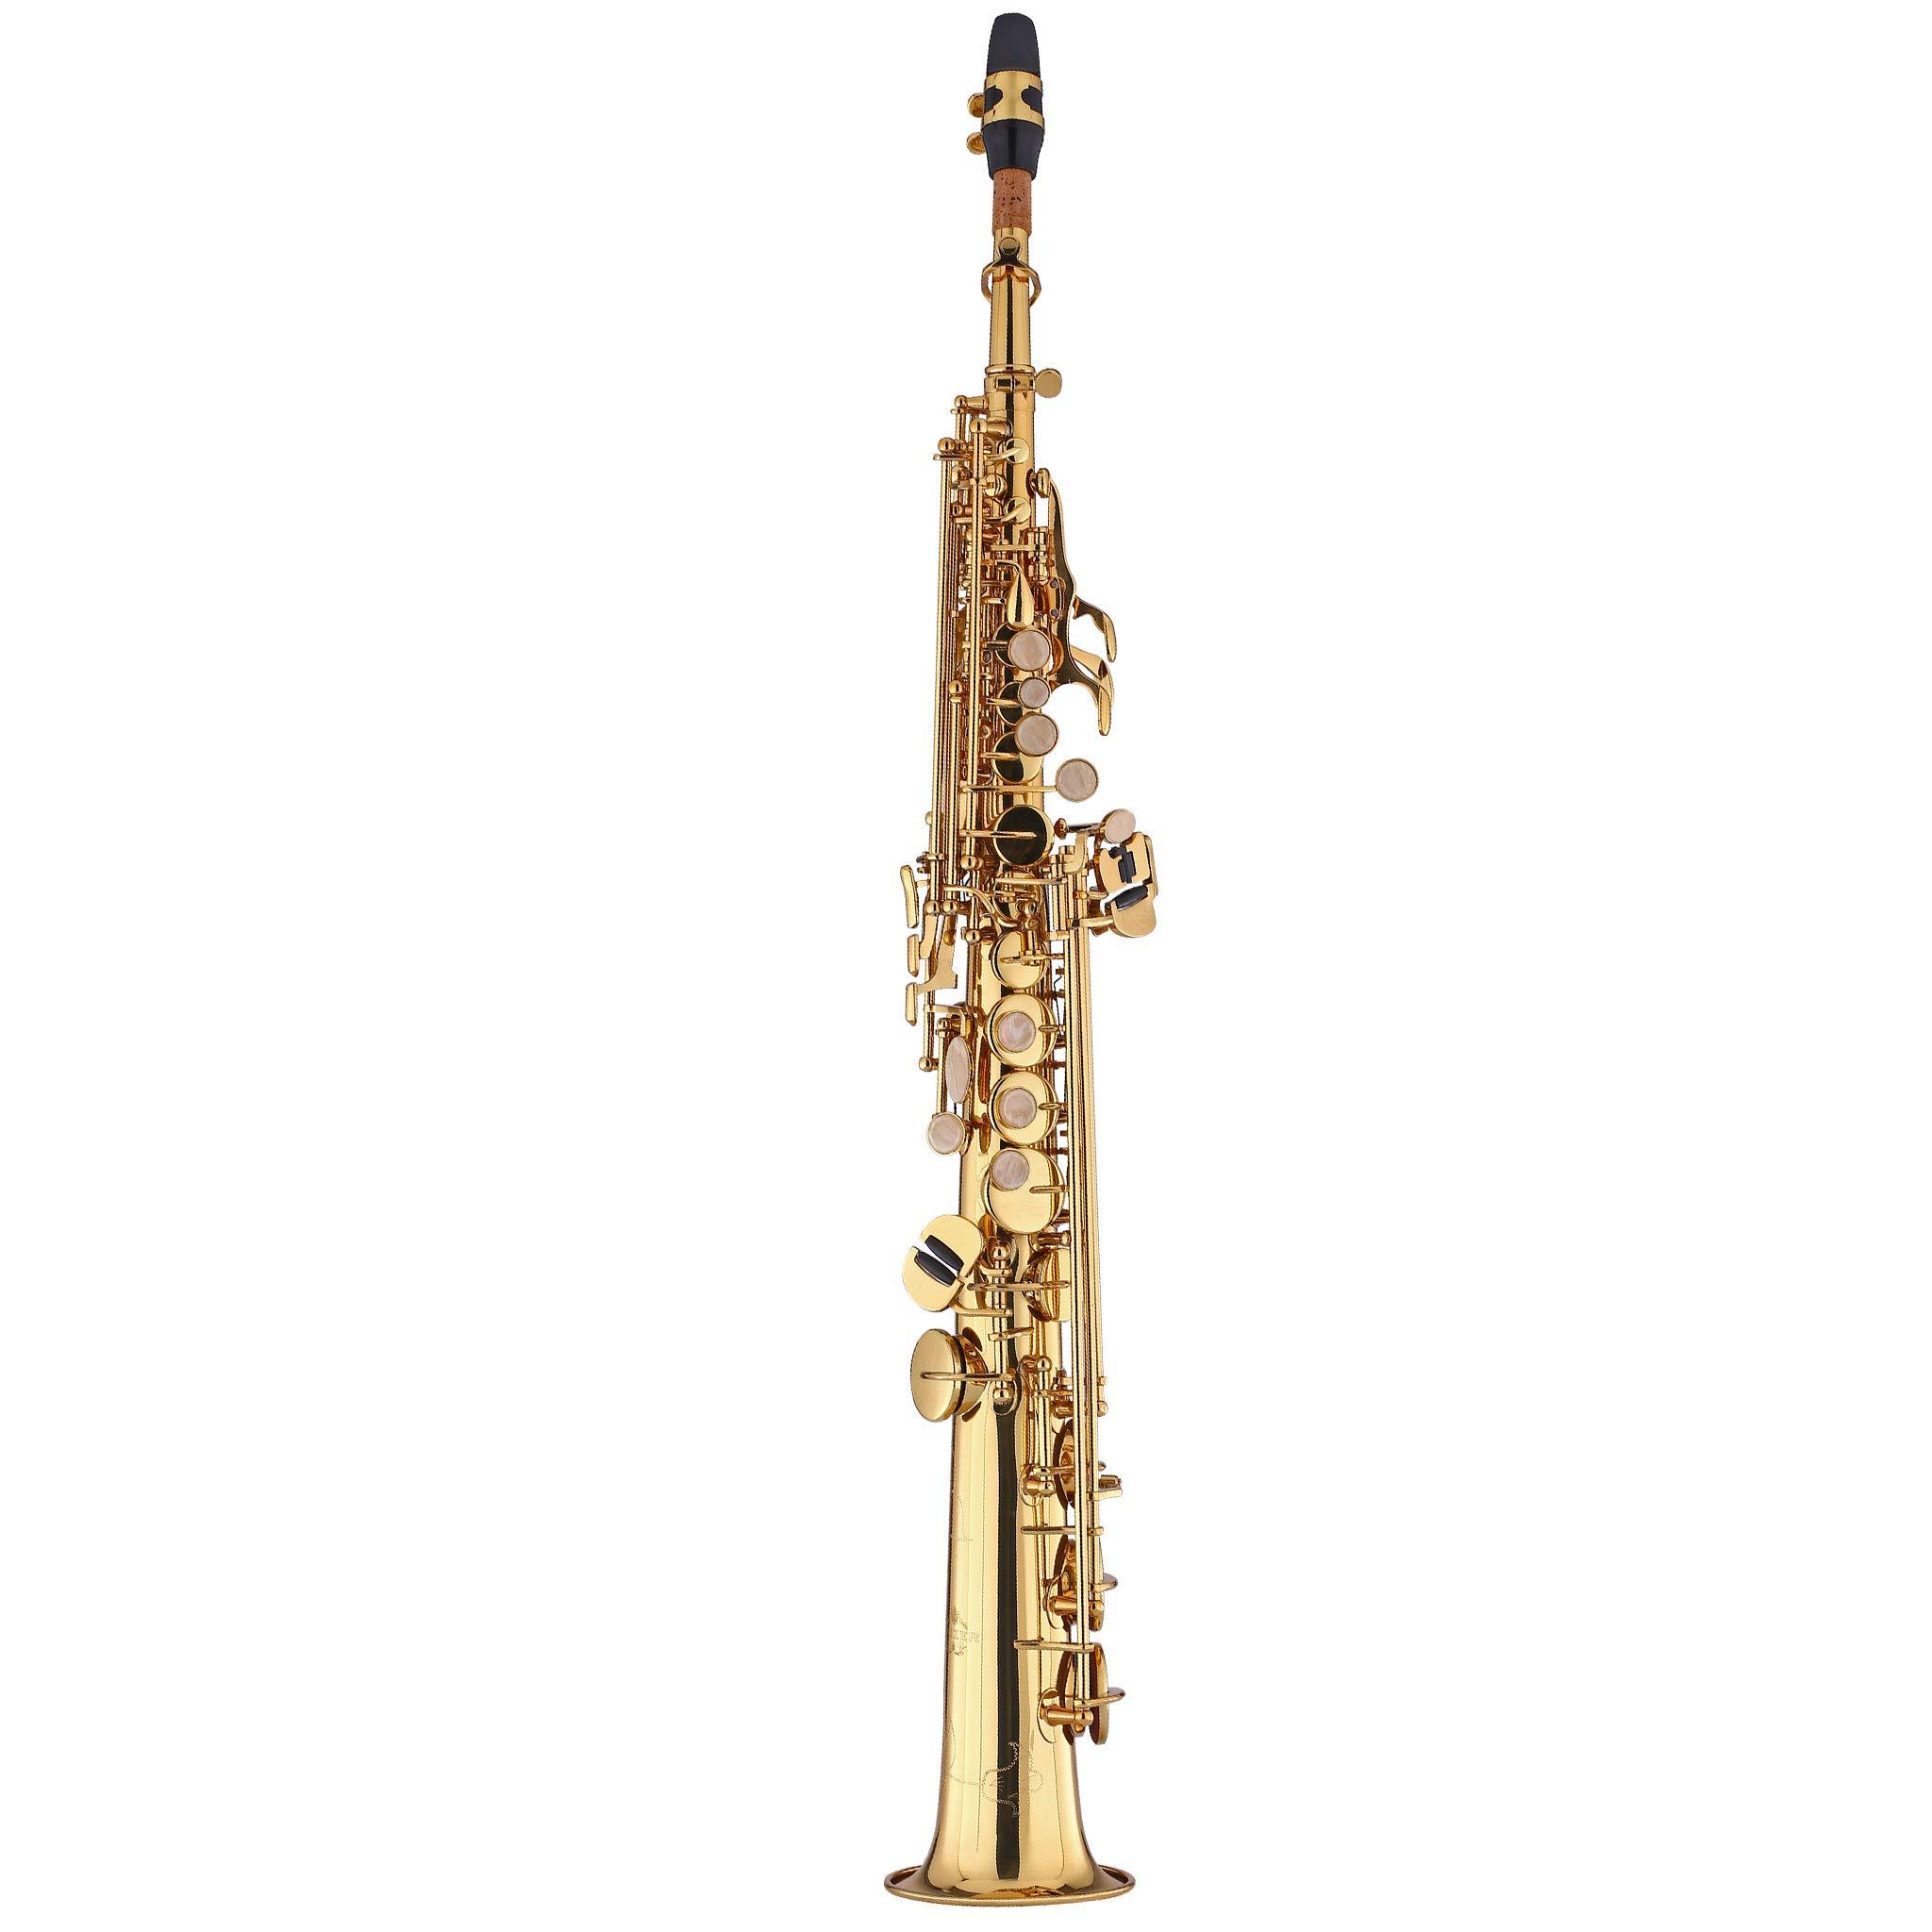 Kaizer Soprano Saxophone Straight B Flat Bb Gold Lacquer SSAX-1000LQ